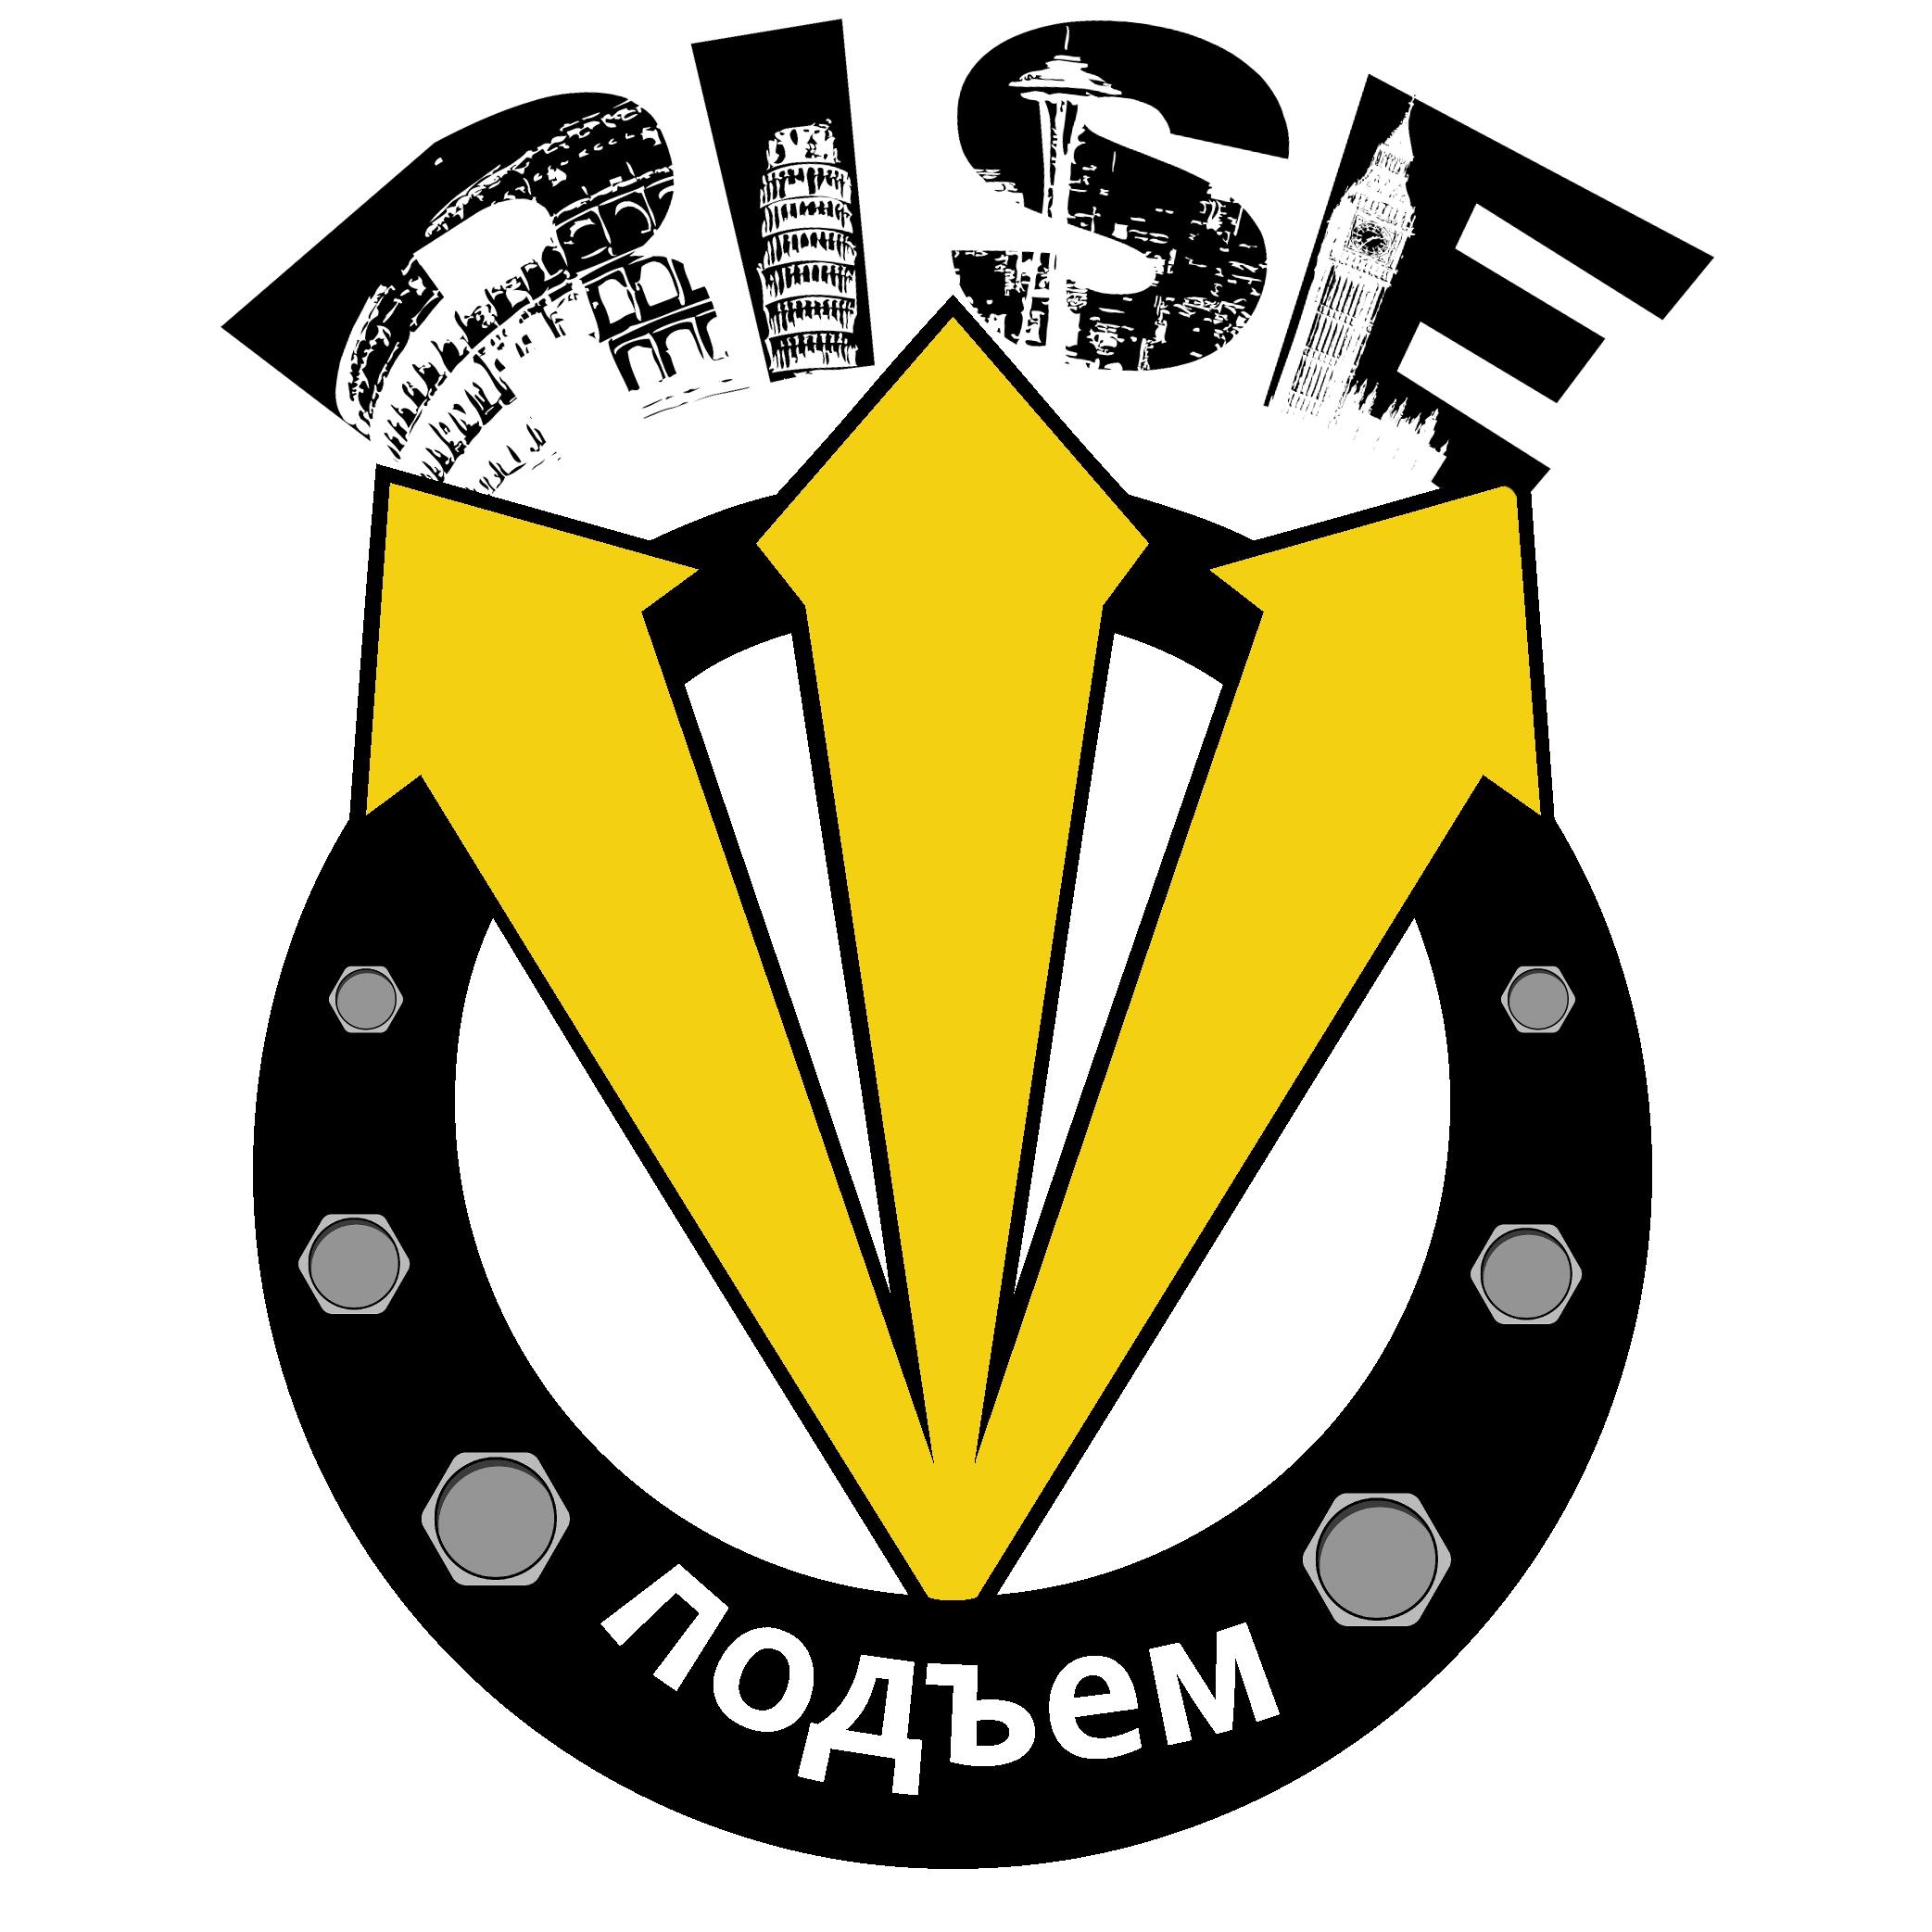 Logo Design by dallywopper - Entry No. 8 in the Logo Design Contest Artistic Logo Design for подъем.